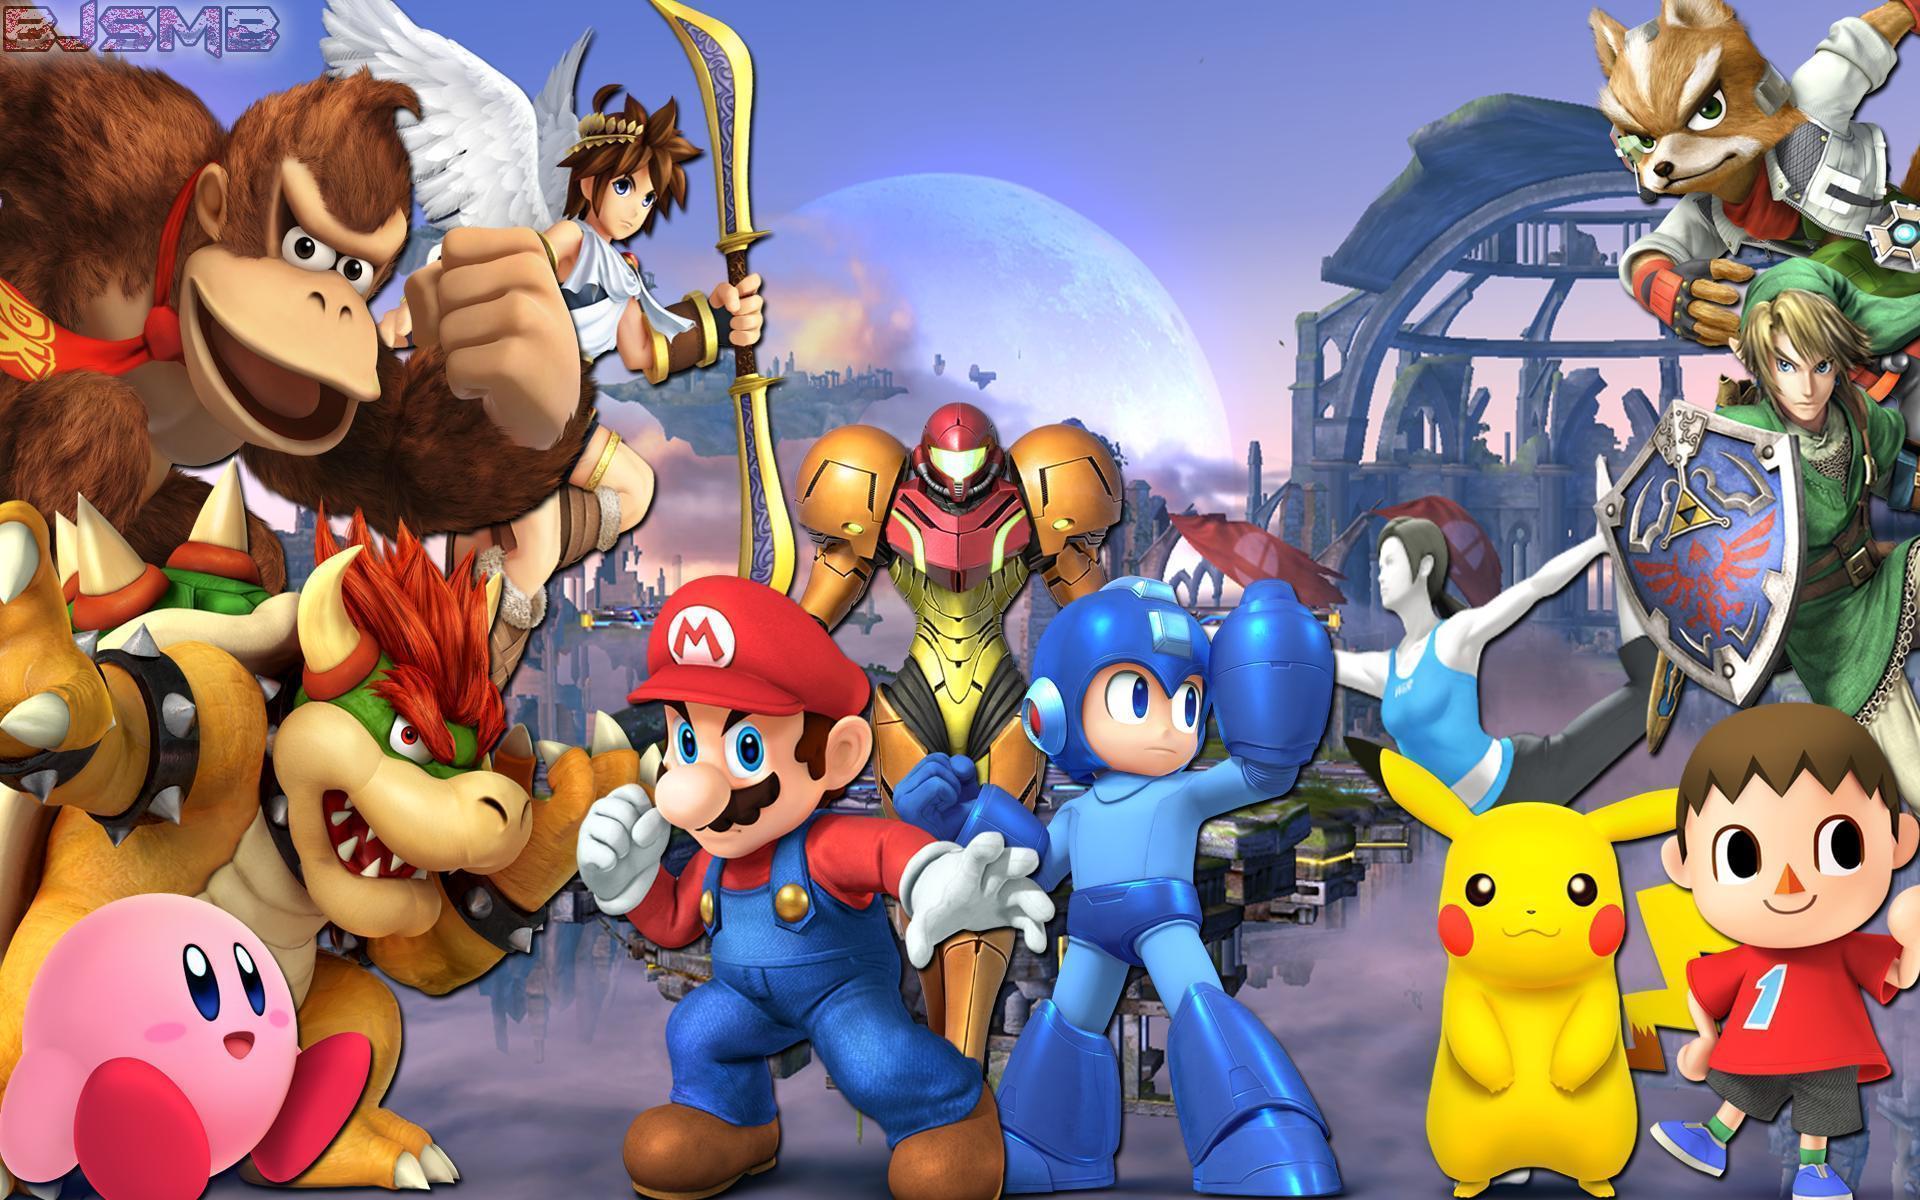 Super Smash Bros. Wallpapers - Wallpaper Cave